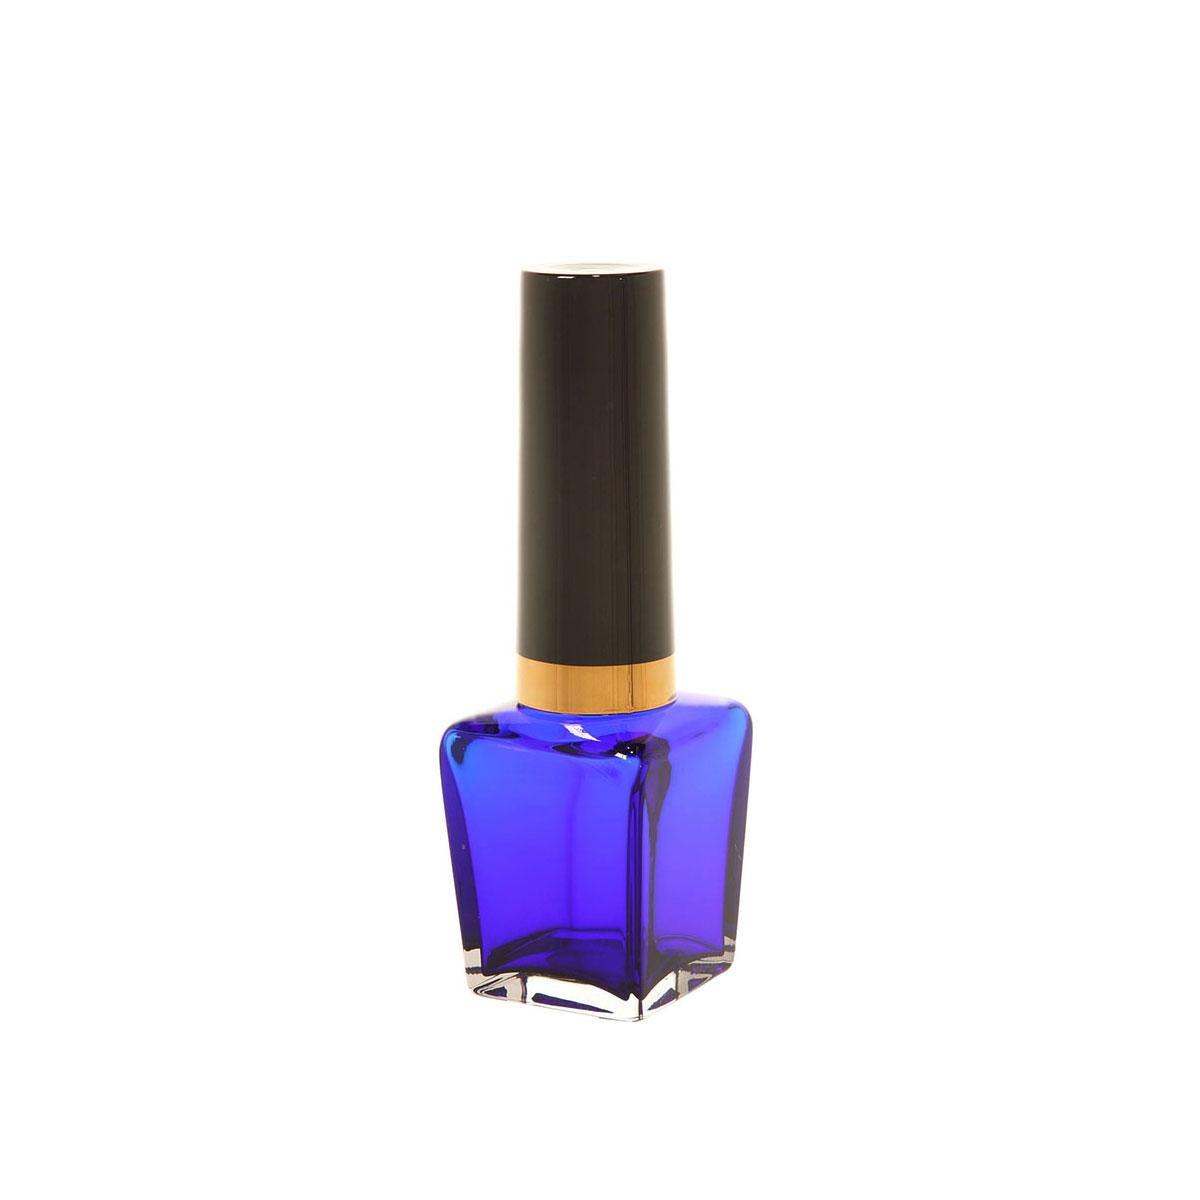 Kosta Boda Art Glass, Asa Jungnelius Make Up Square Blue Nail Polish, Limited Edition of 20